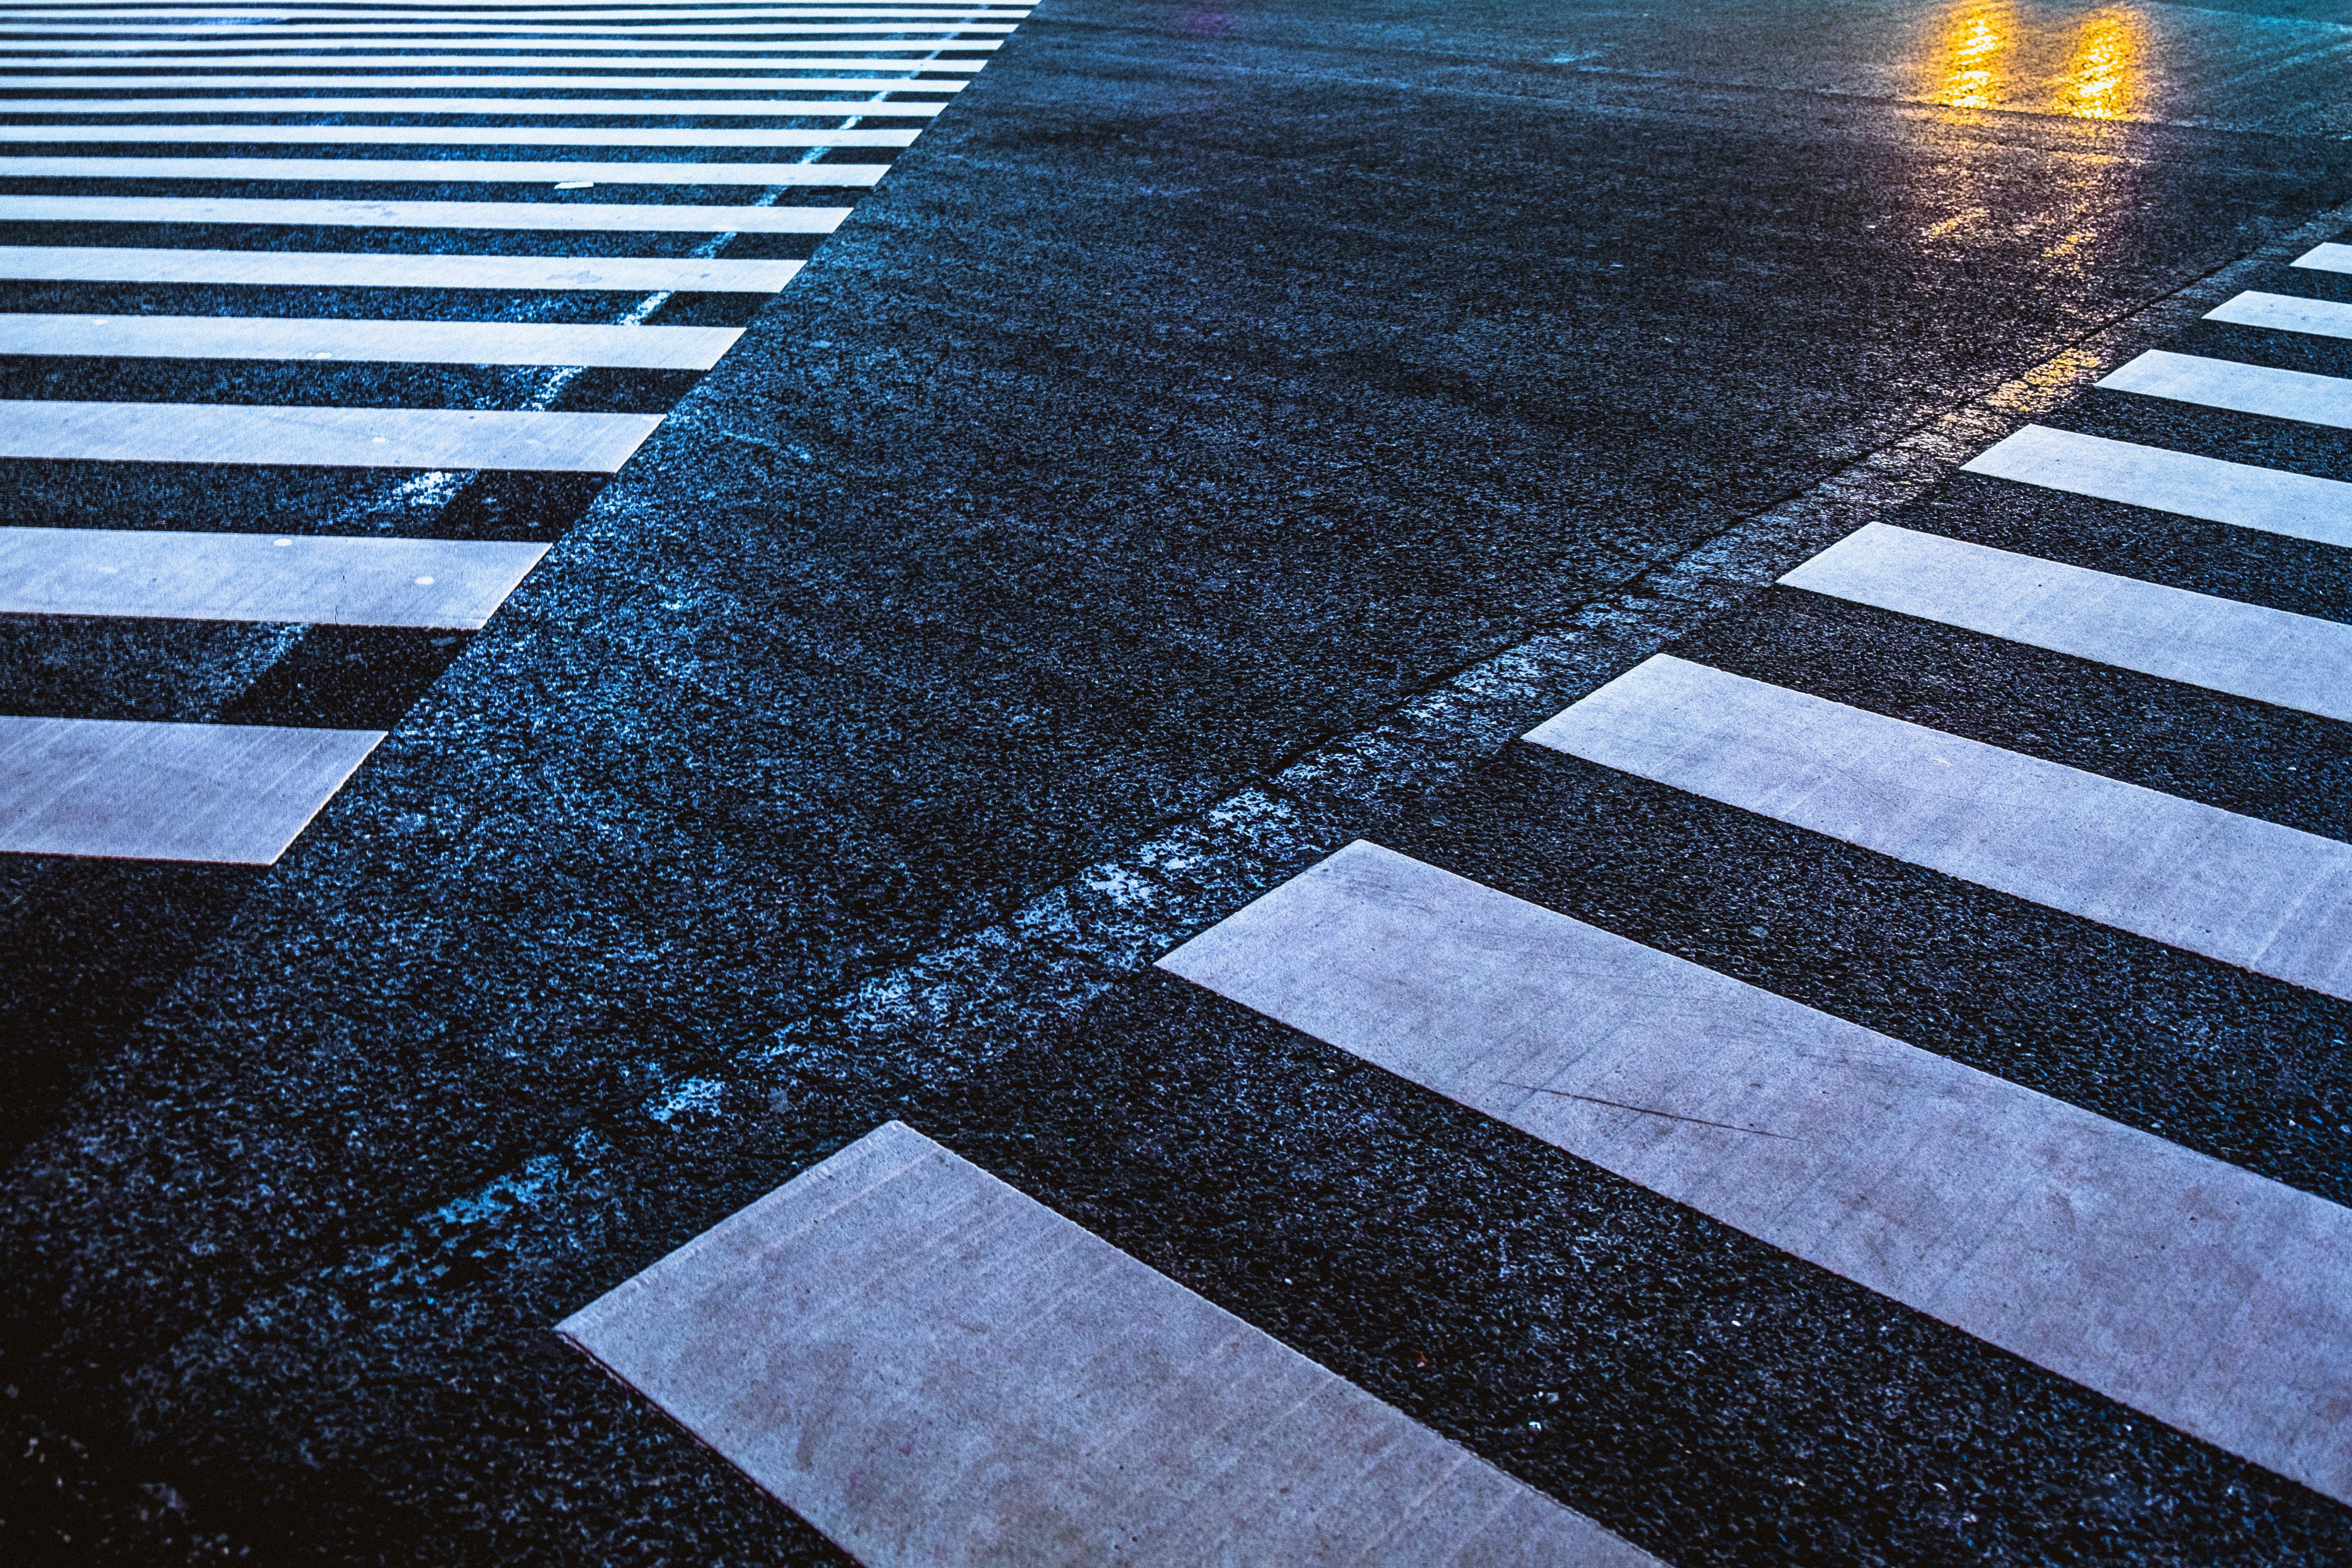 water-light-road-floor-urban-asphalt-wal